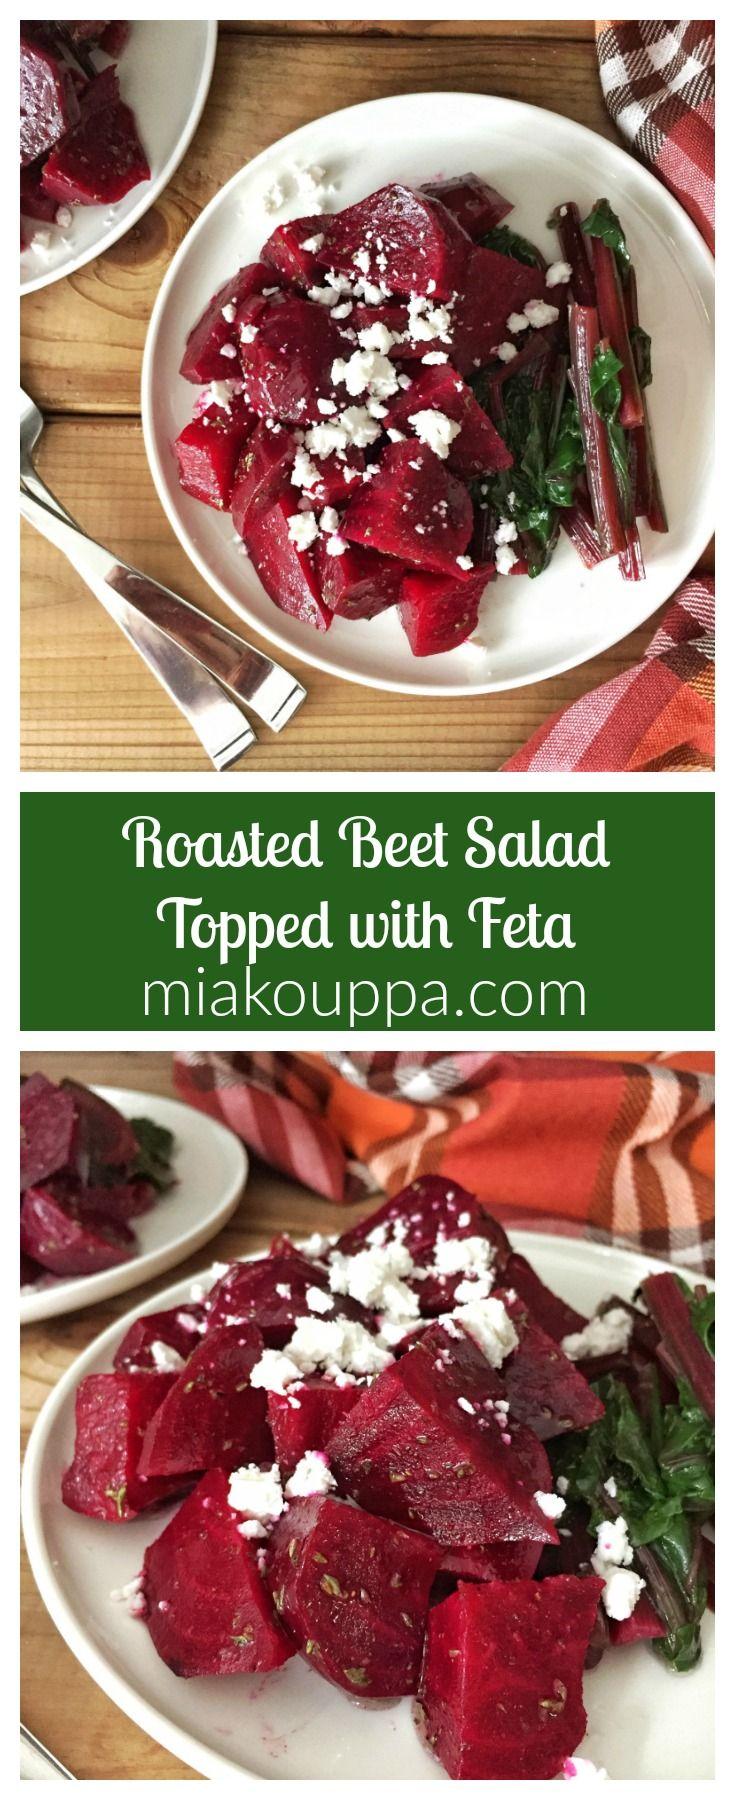 Roasted beet salad (Σαλάτα με παντζάρια)